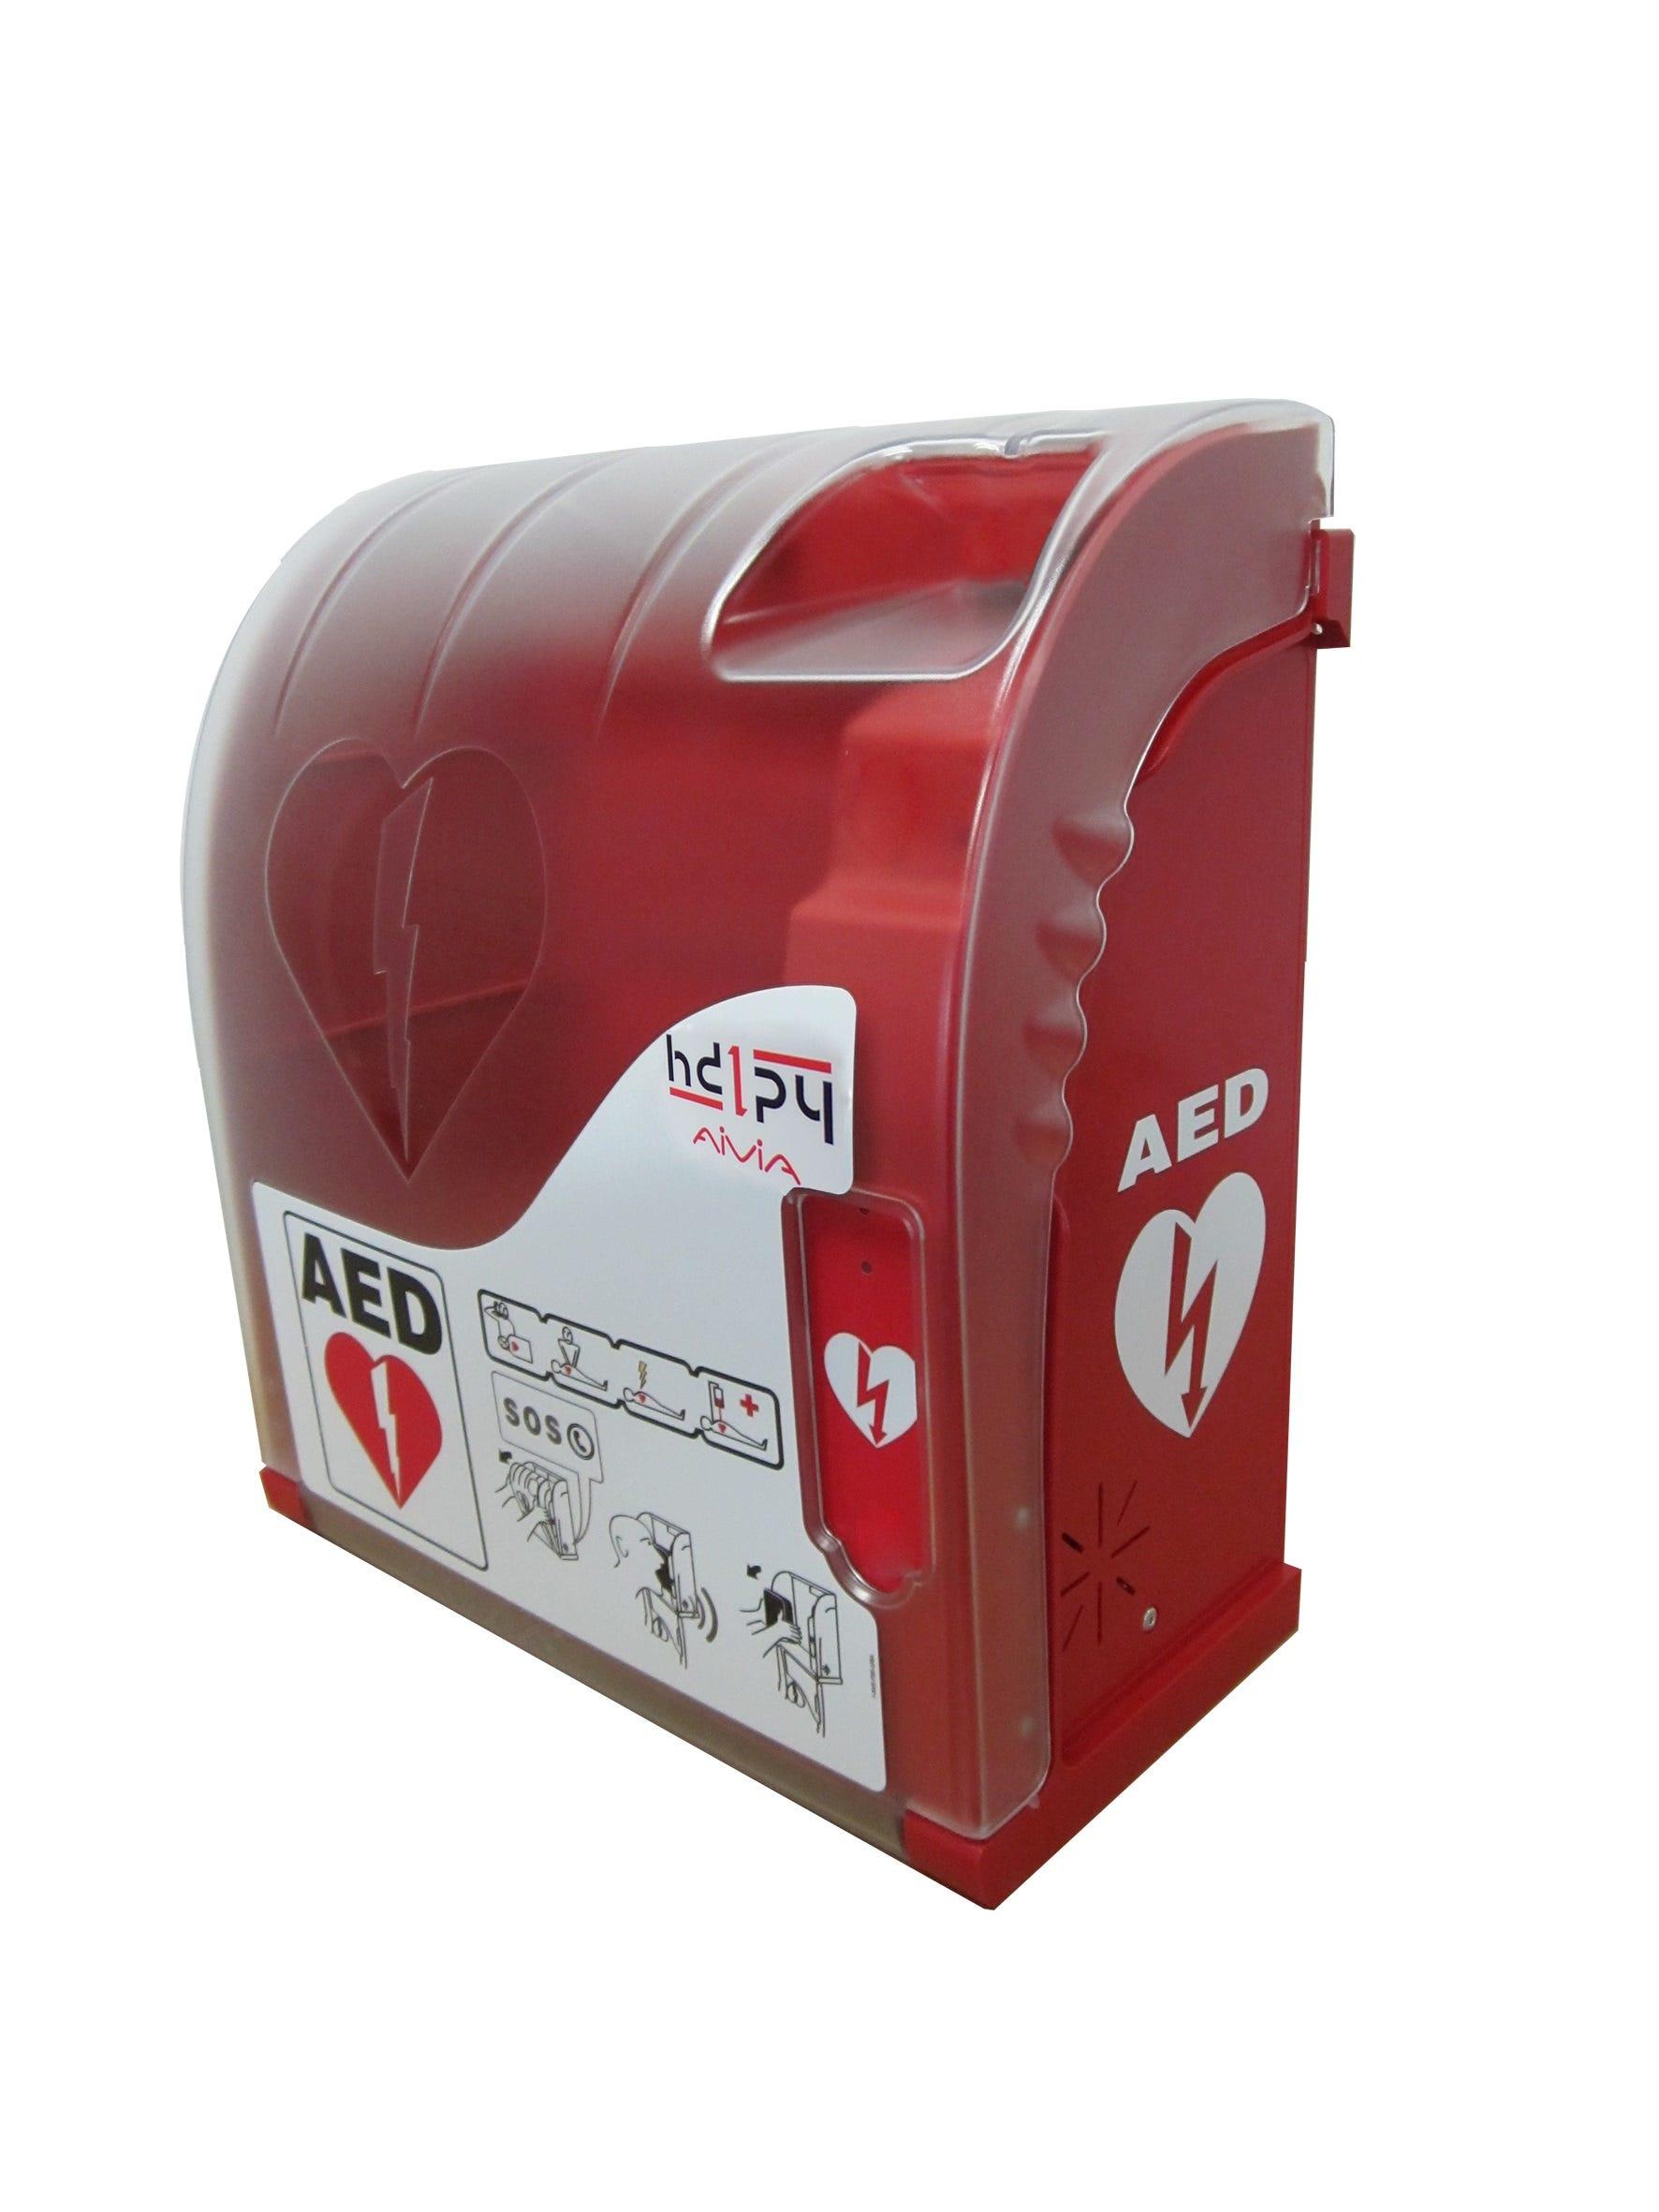 School Health 50 Basic AED Cabinet